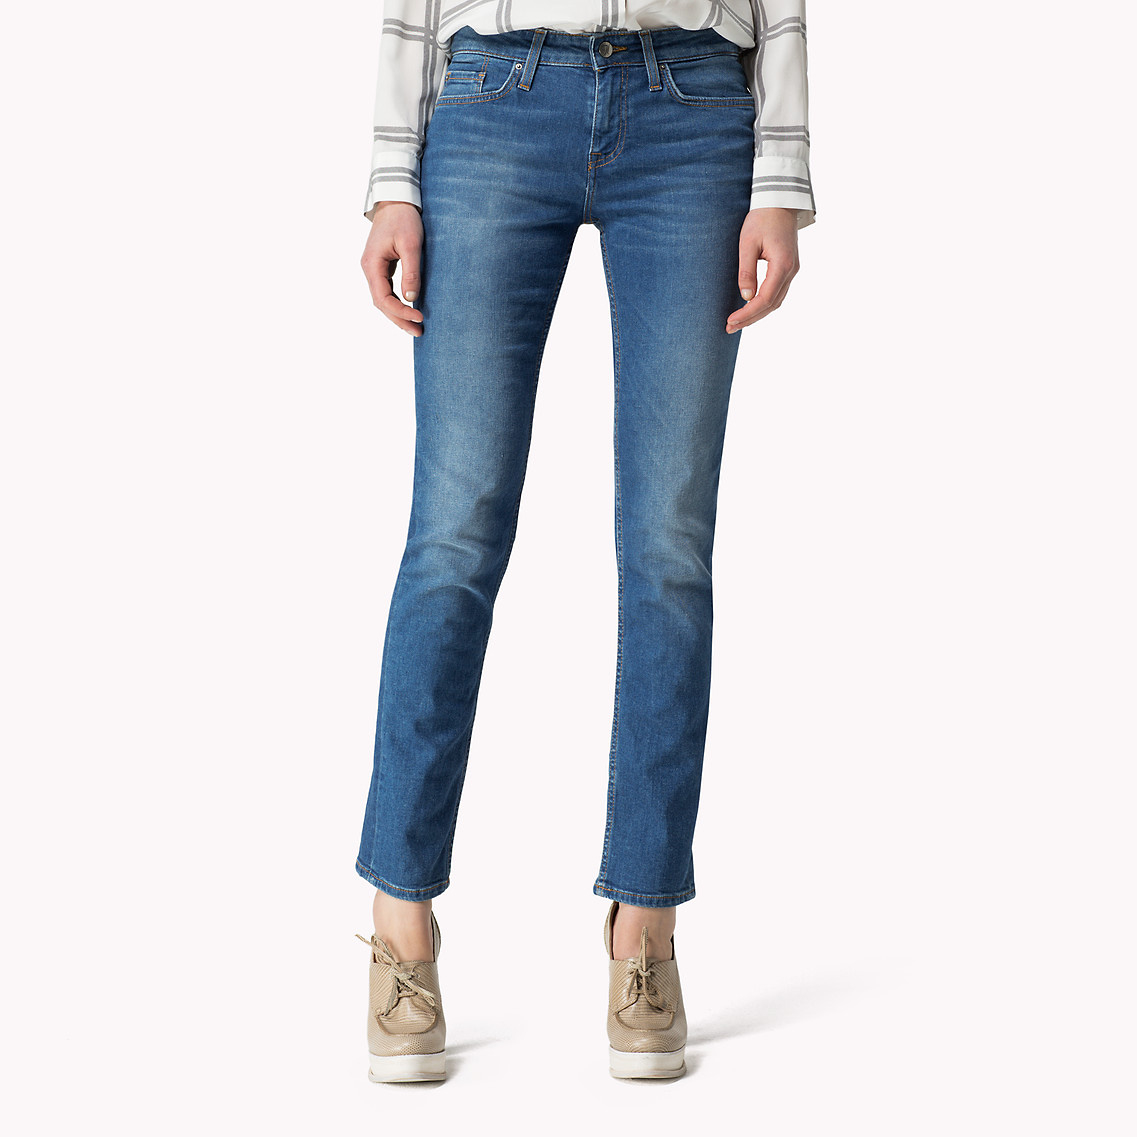 tommy hilfiger straight fit jeans in blue sarah lyst. Black Bedroom Furniture Sets. Home Design Ideas